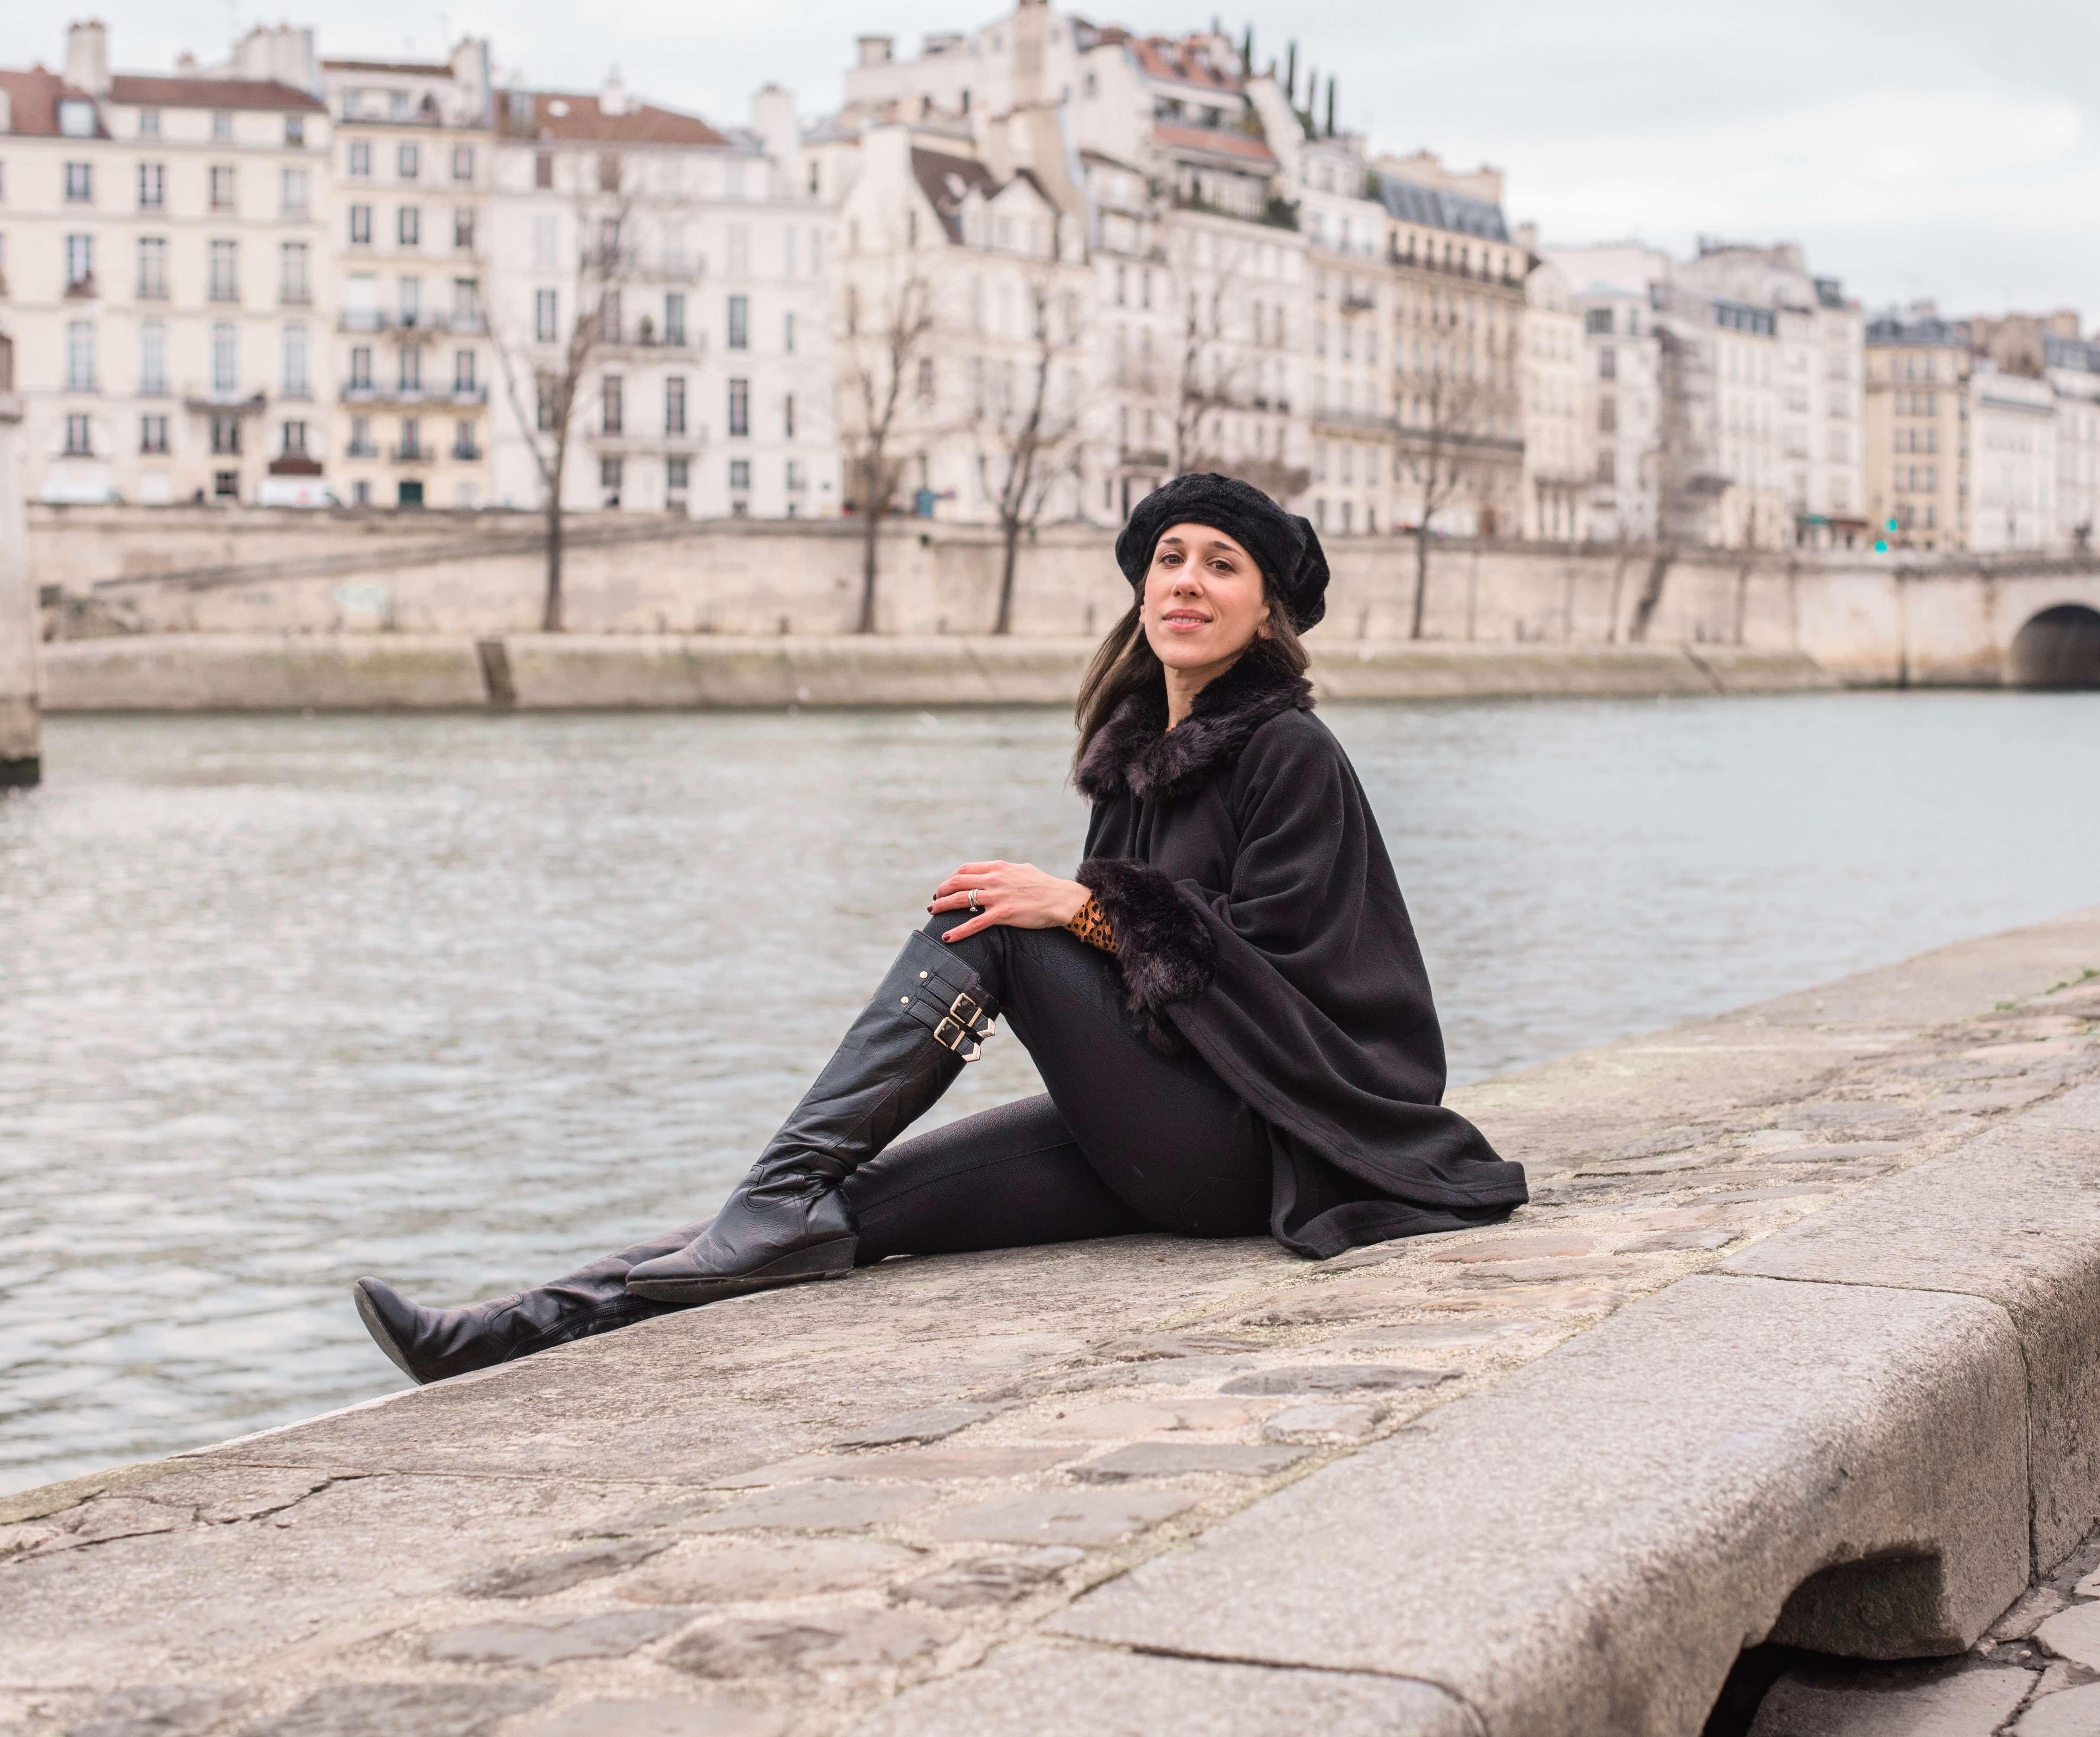 Loving life on the Seine River, Paris